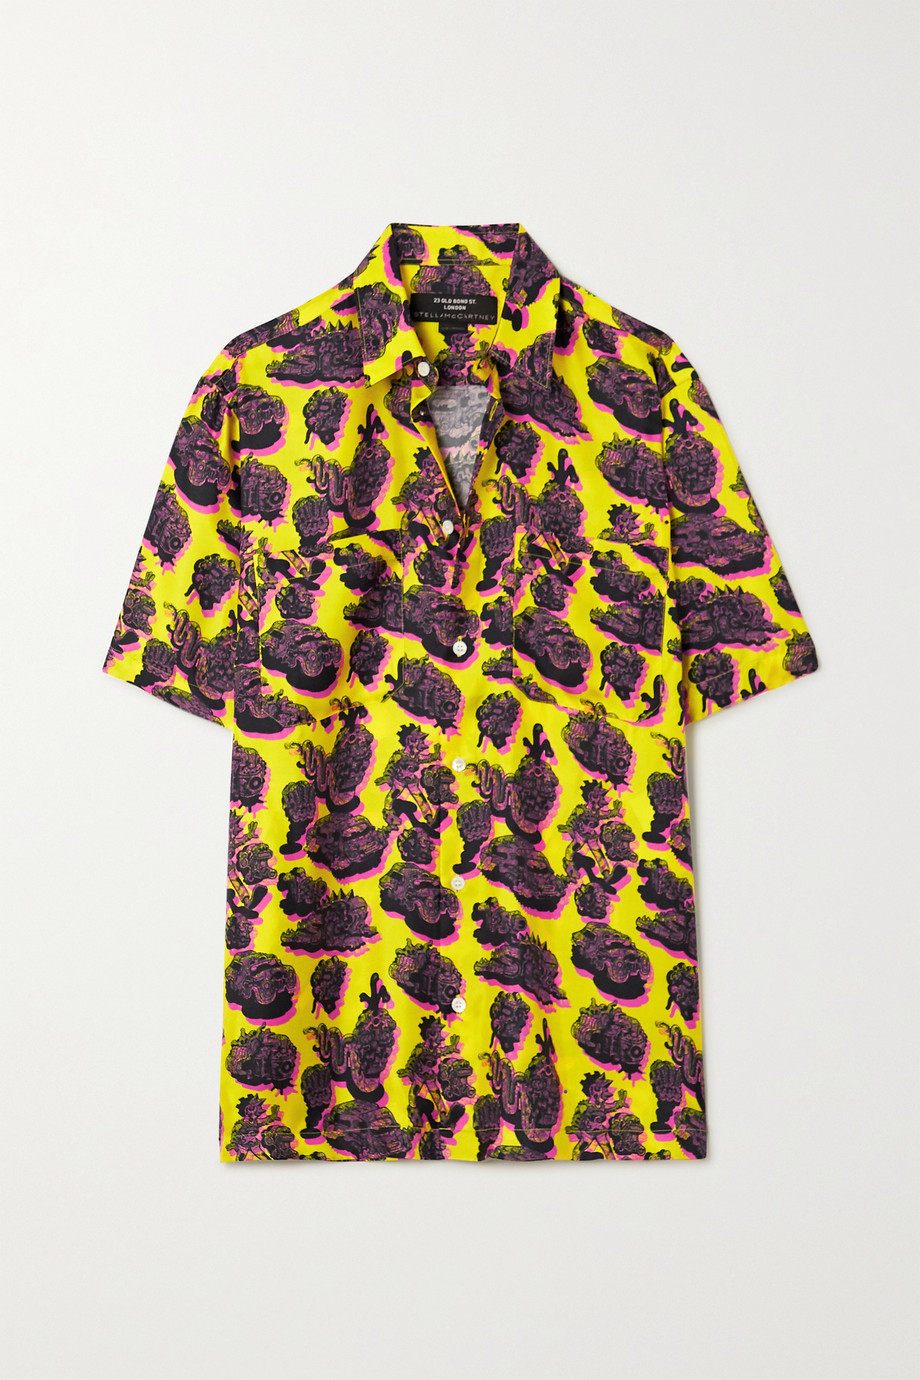 Stella McCartney Ricky Hemd aus bedrucktem Seiden-Twill